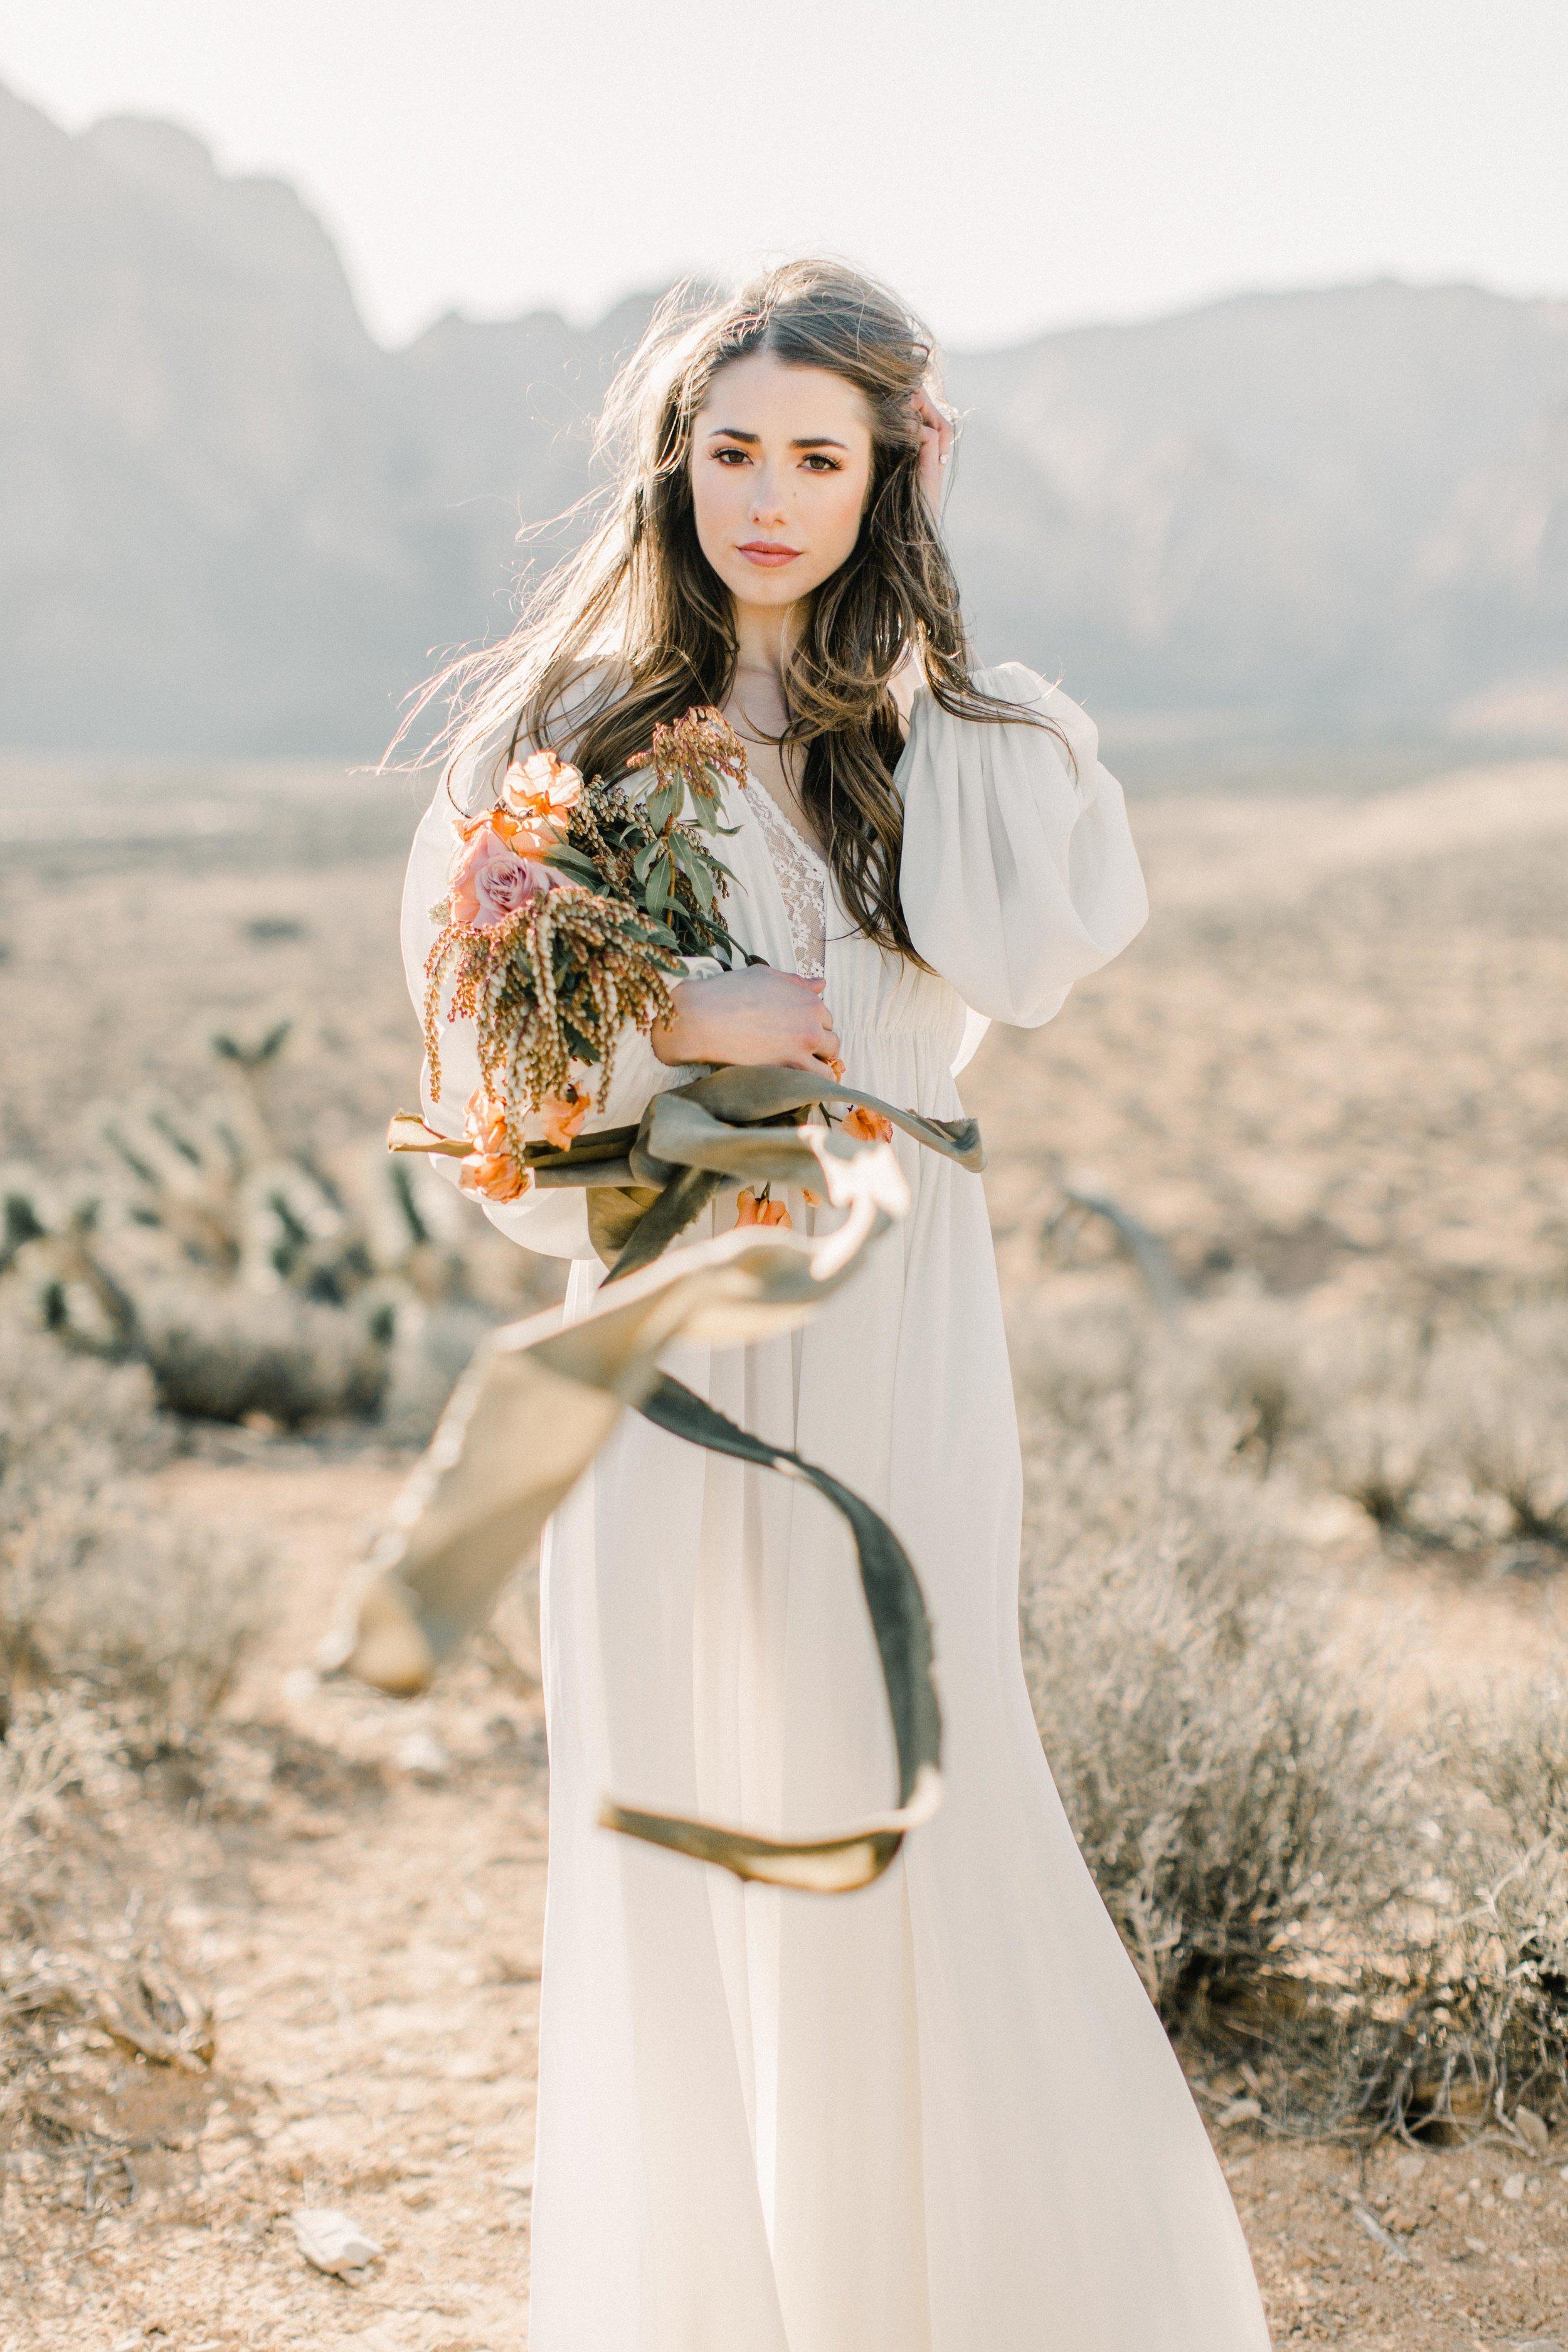 Desert Elopement | Las Vegas Wedding | Desert Wedding | Babsie Ly Photography | Julie Paisley Shootout | Fine Art Wedding Blog | Joy Wed | Canadian Wedding Blog | Stacey Foley Design